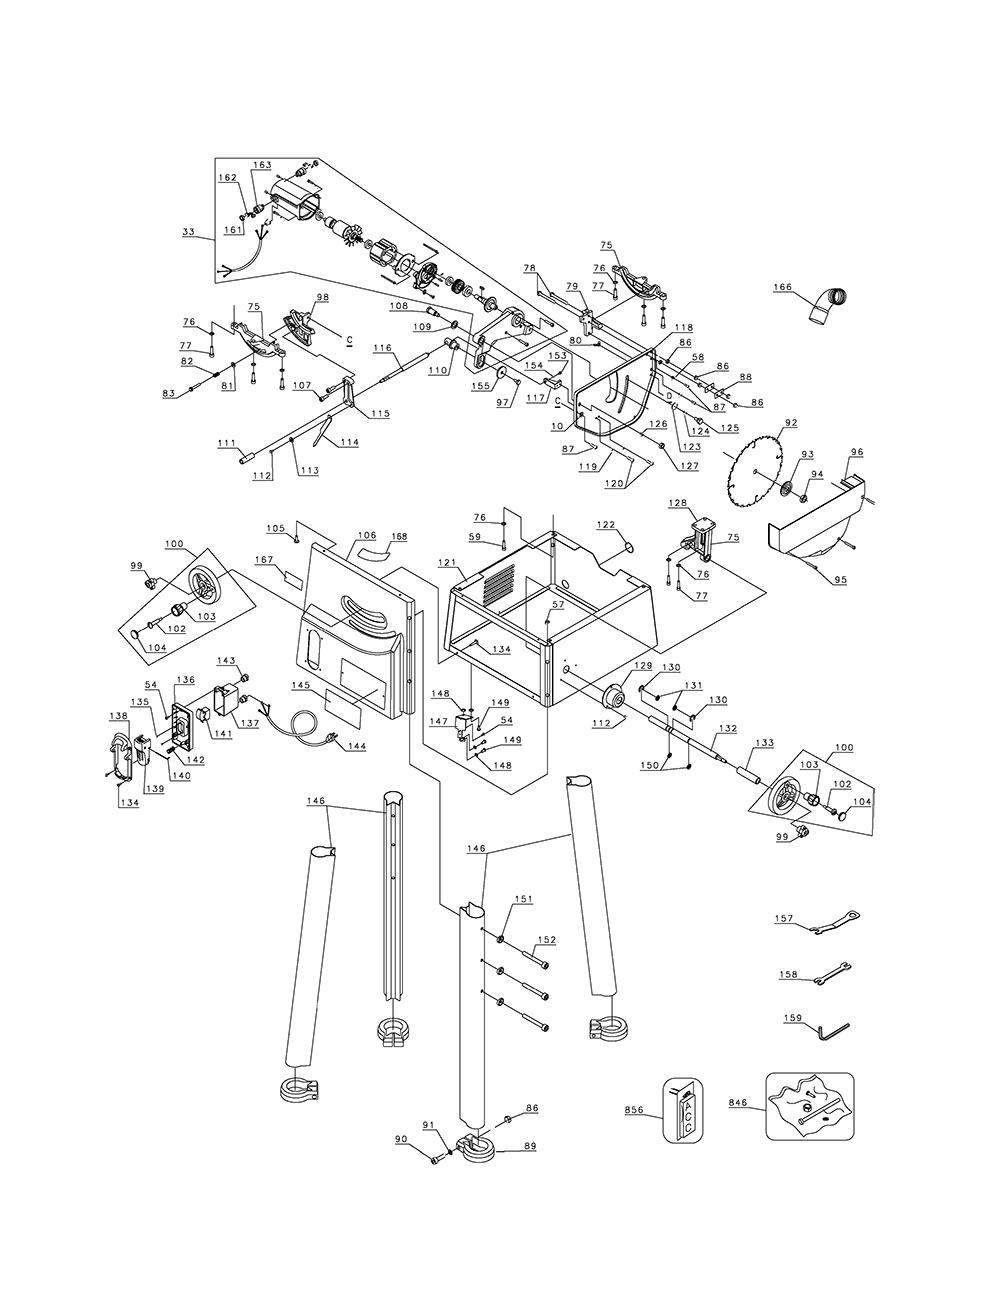 FS2500TS-BlackandDecker-T1-PB-1Break Down